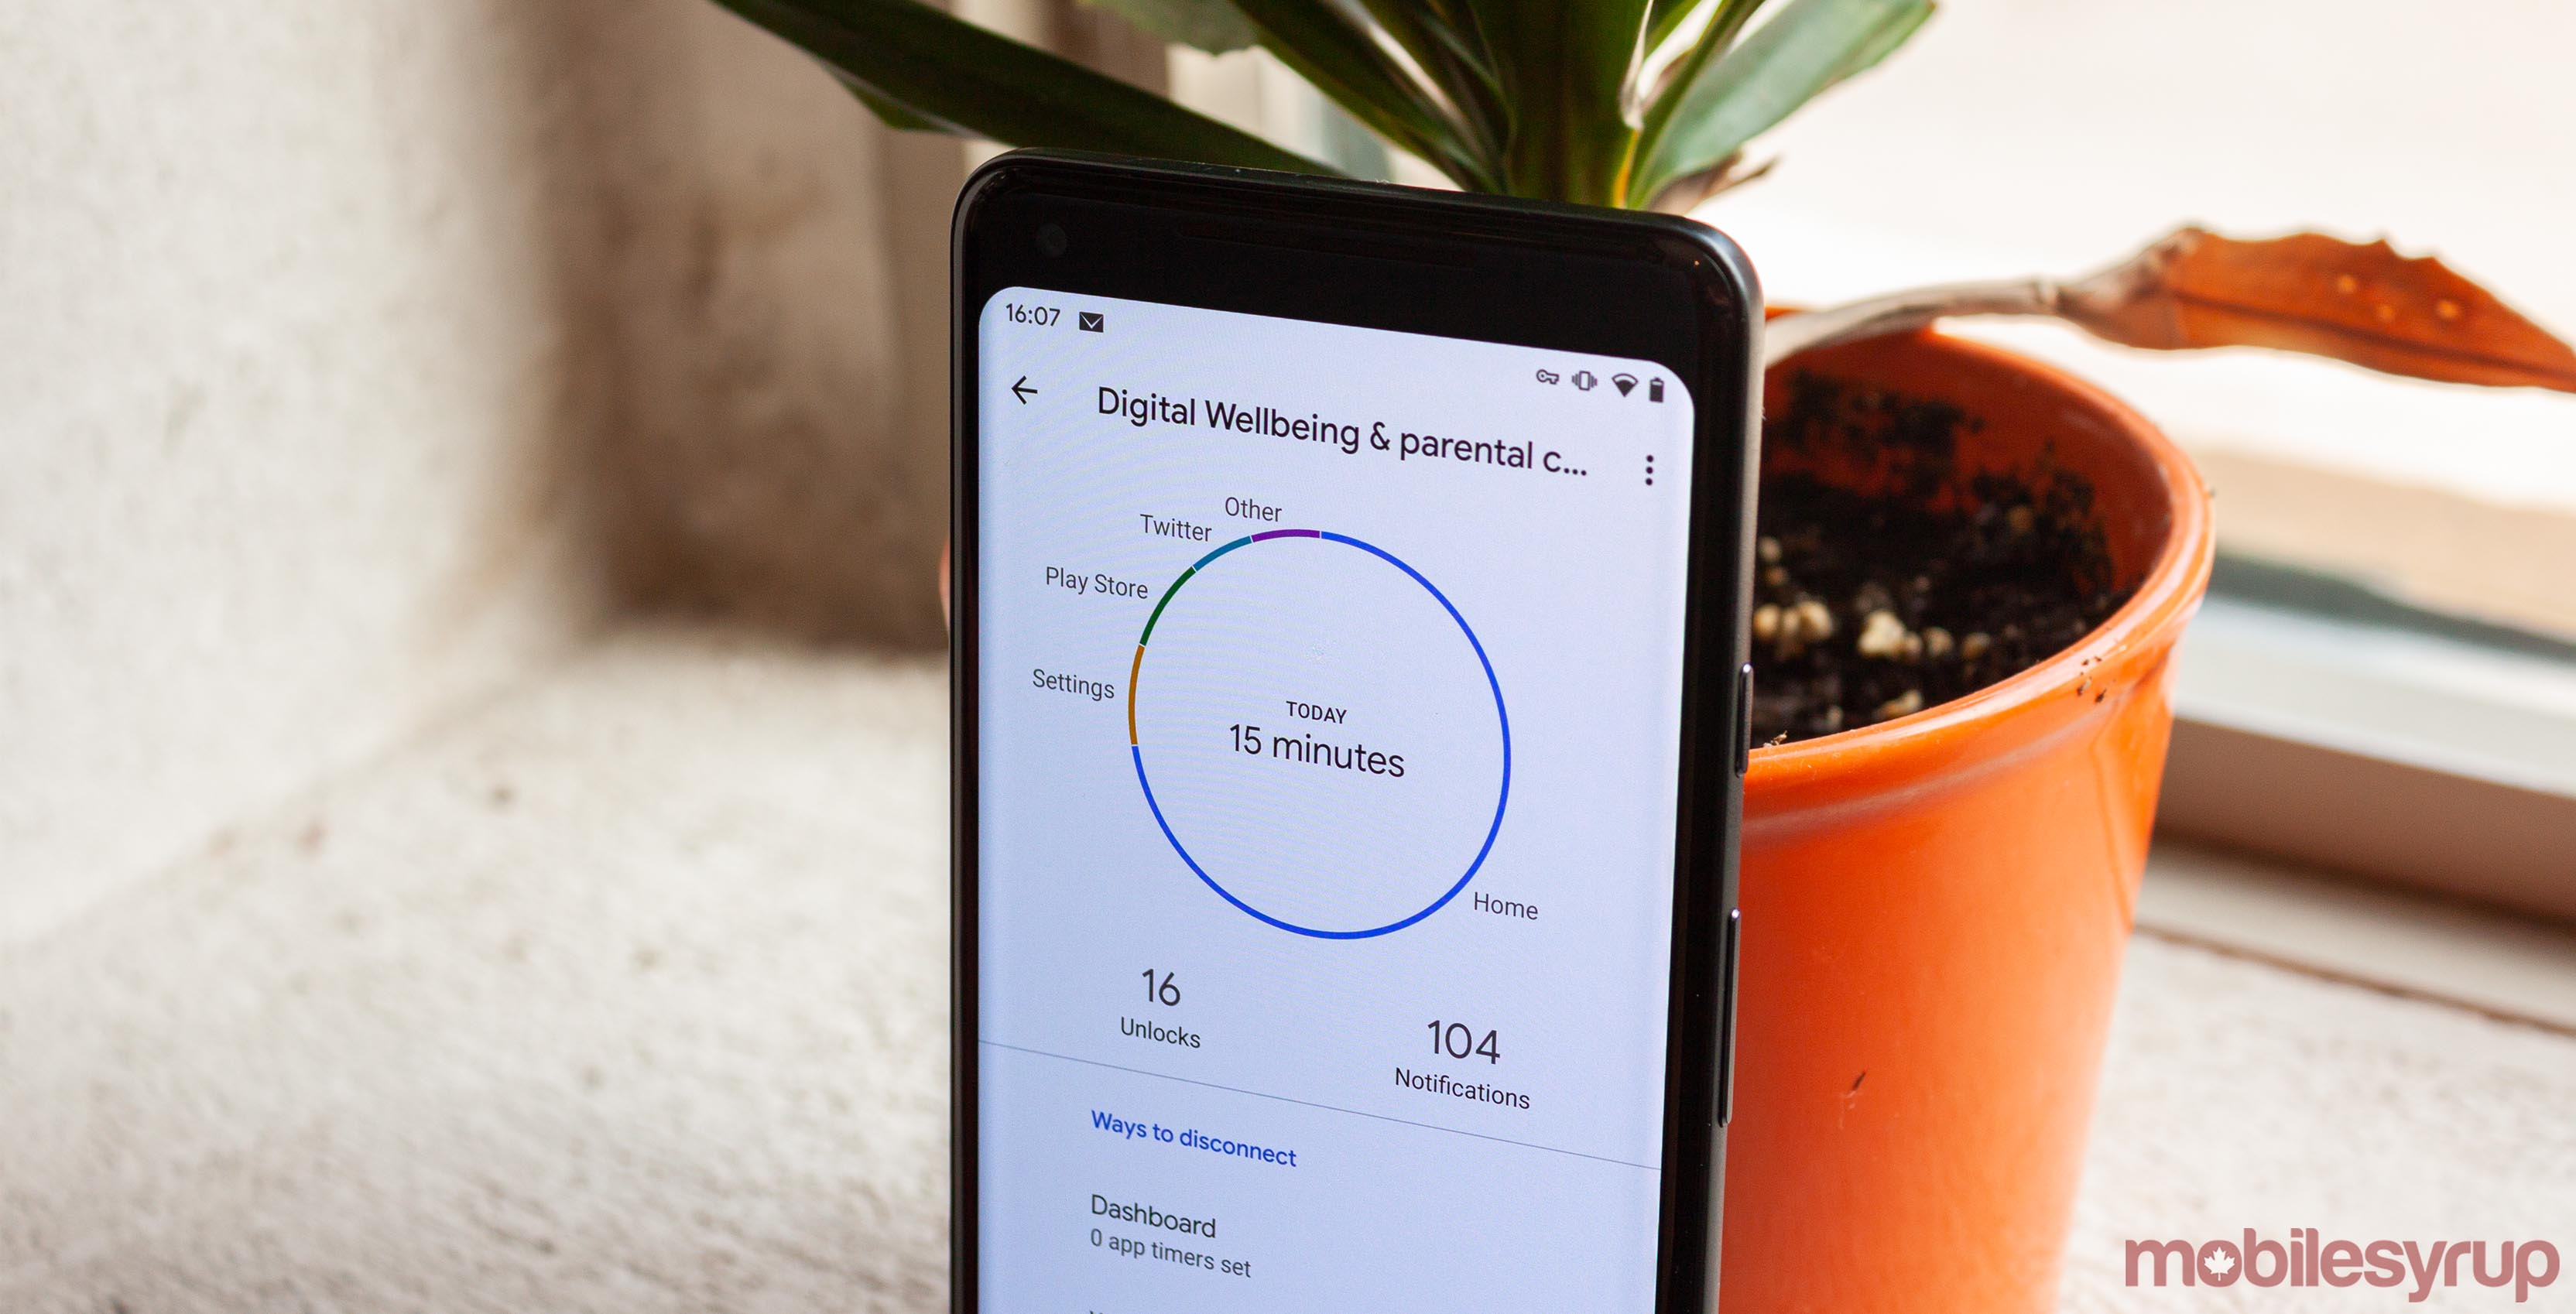 Digital Wellbeing